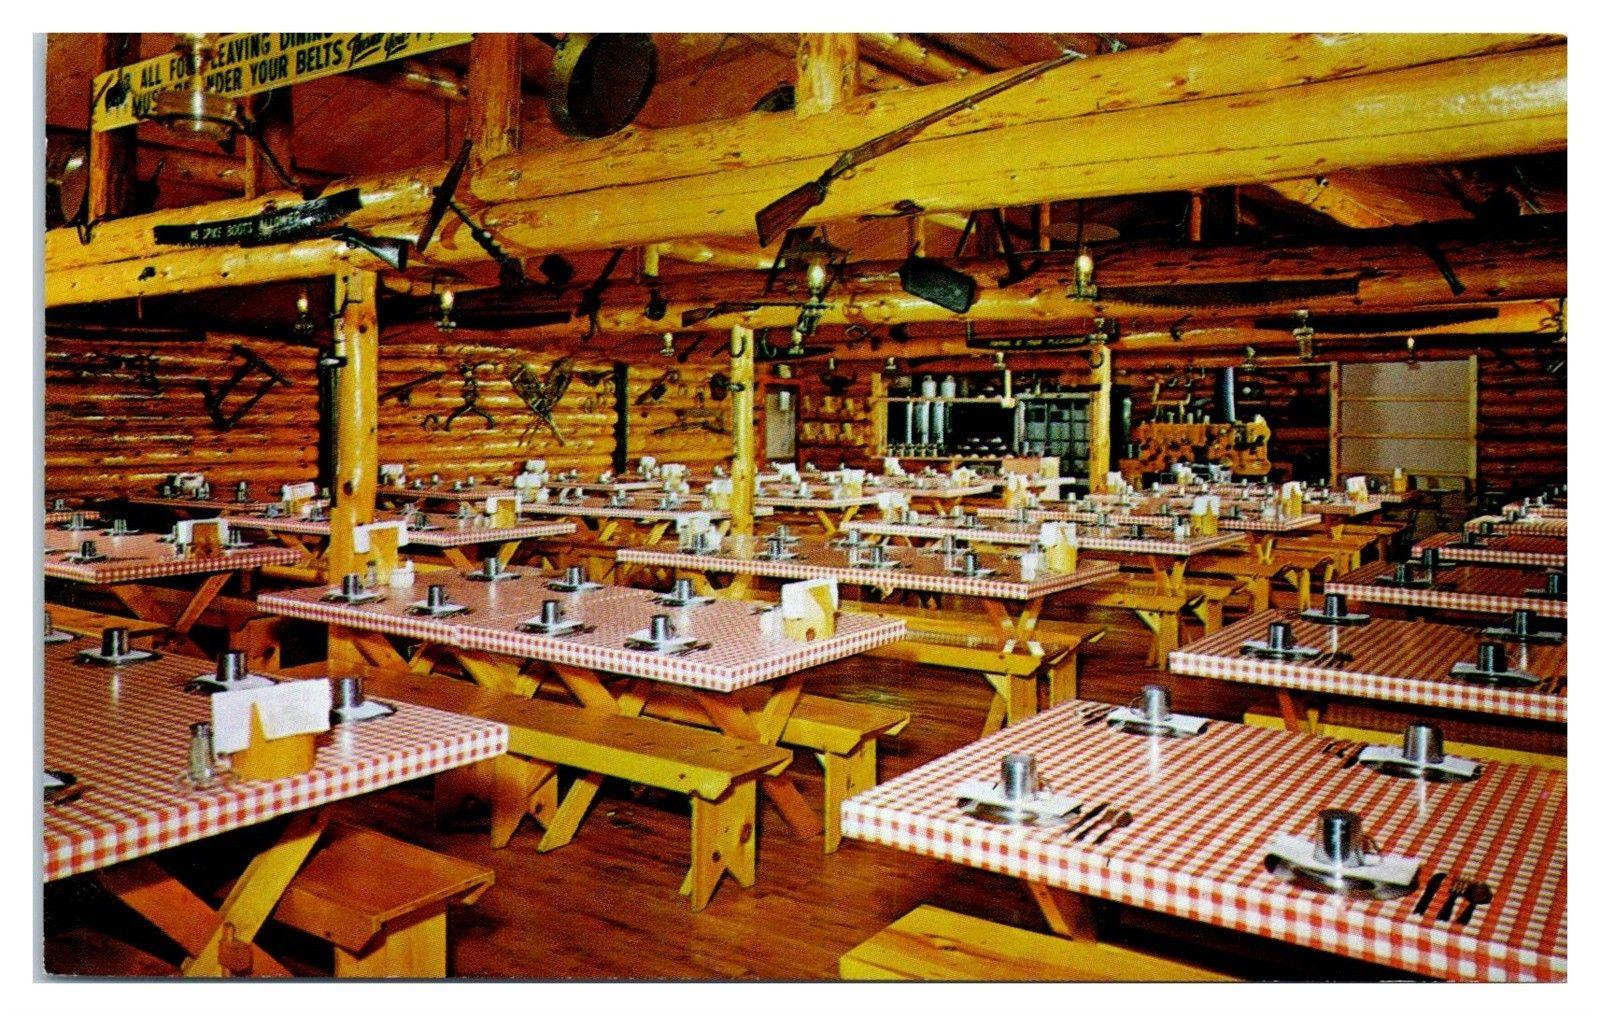 1950s/60s Paul Bunyan Logging Camp Restaurant, Minocqua, WI Postcard